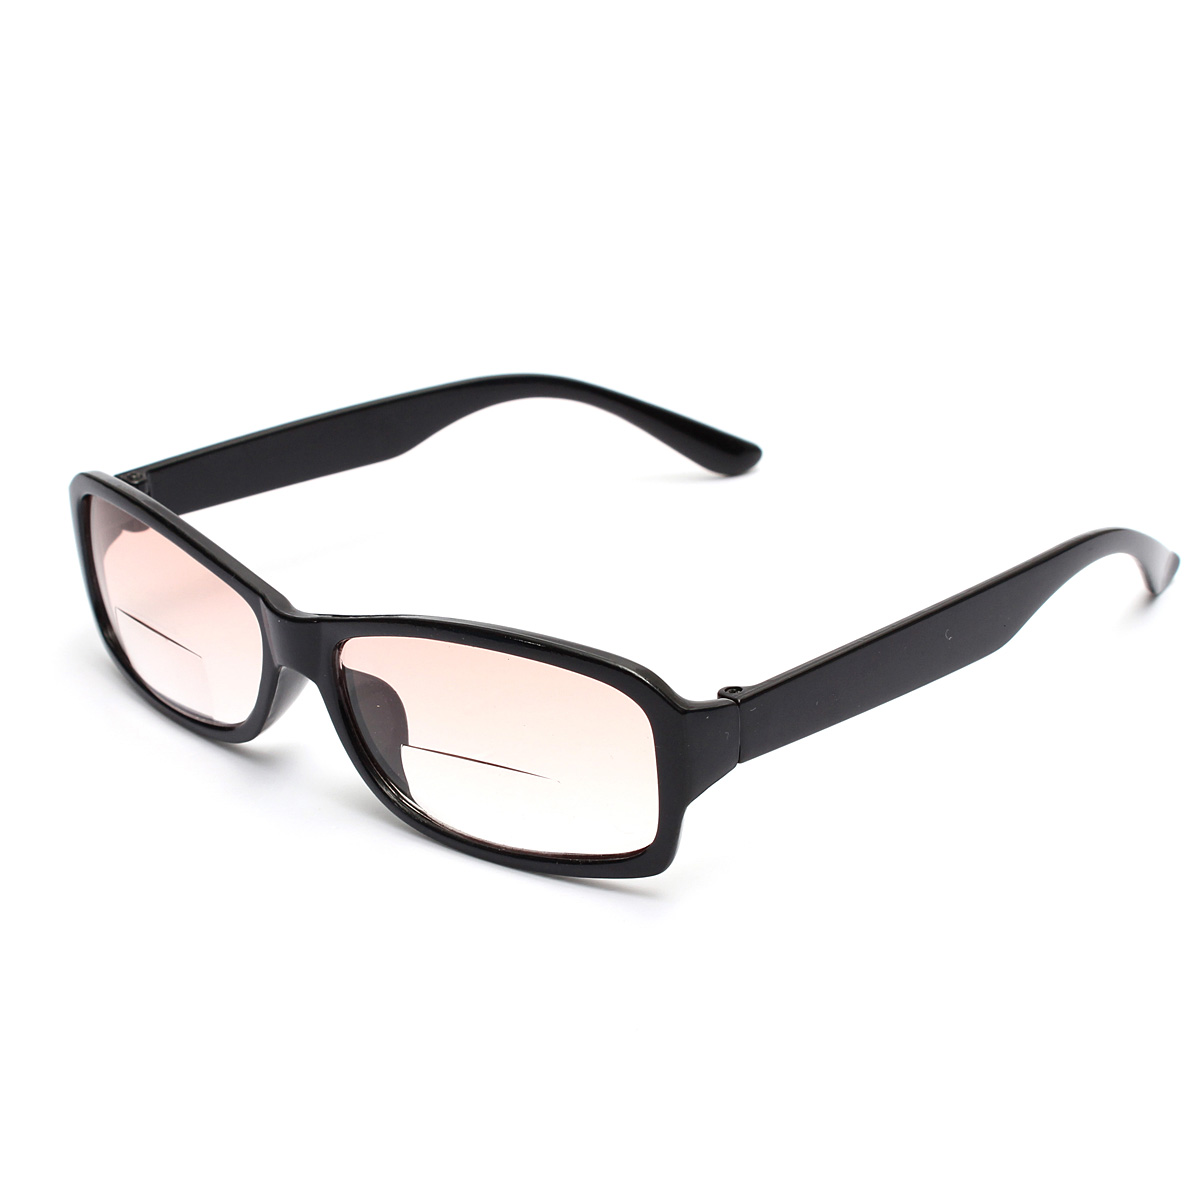 094b2985100e Oakley Reading Glasses 1.0